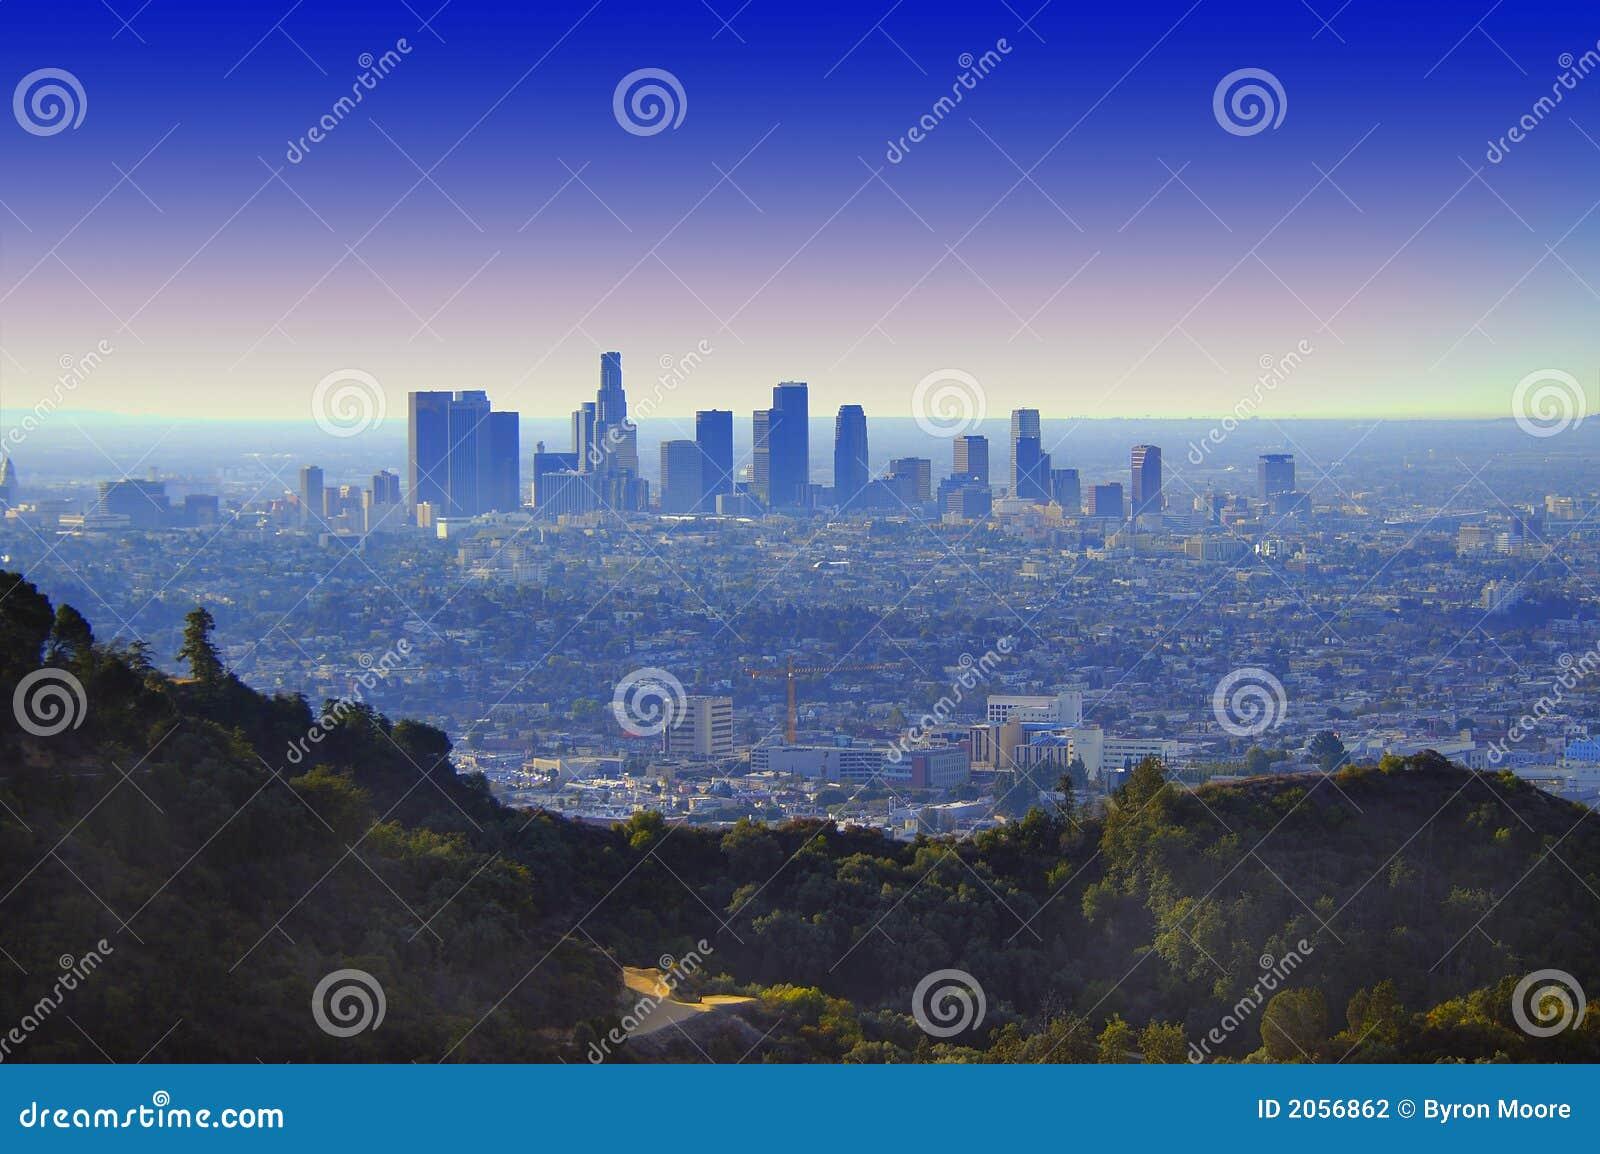 Angeles los